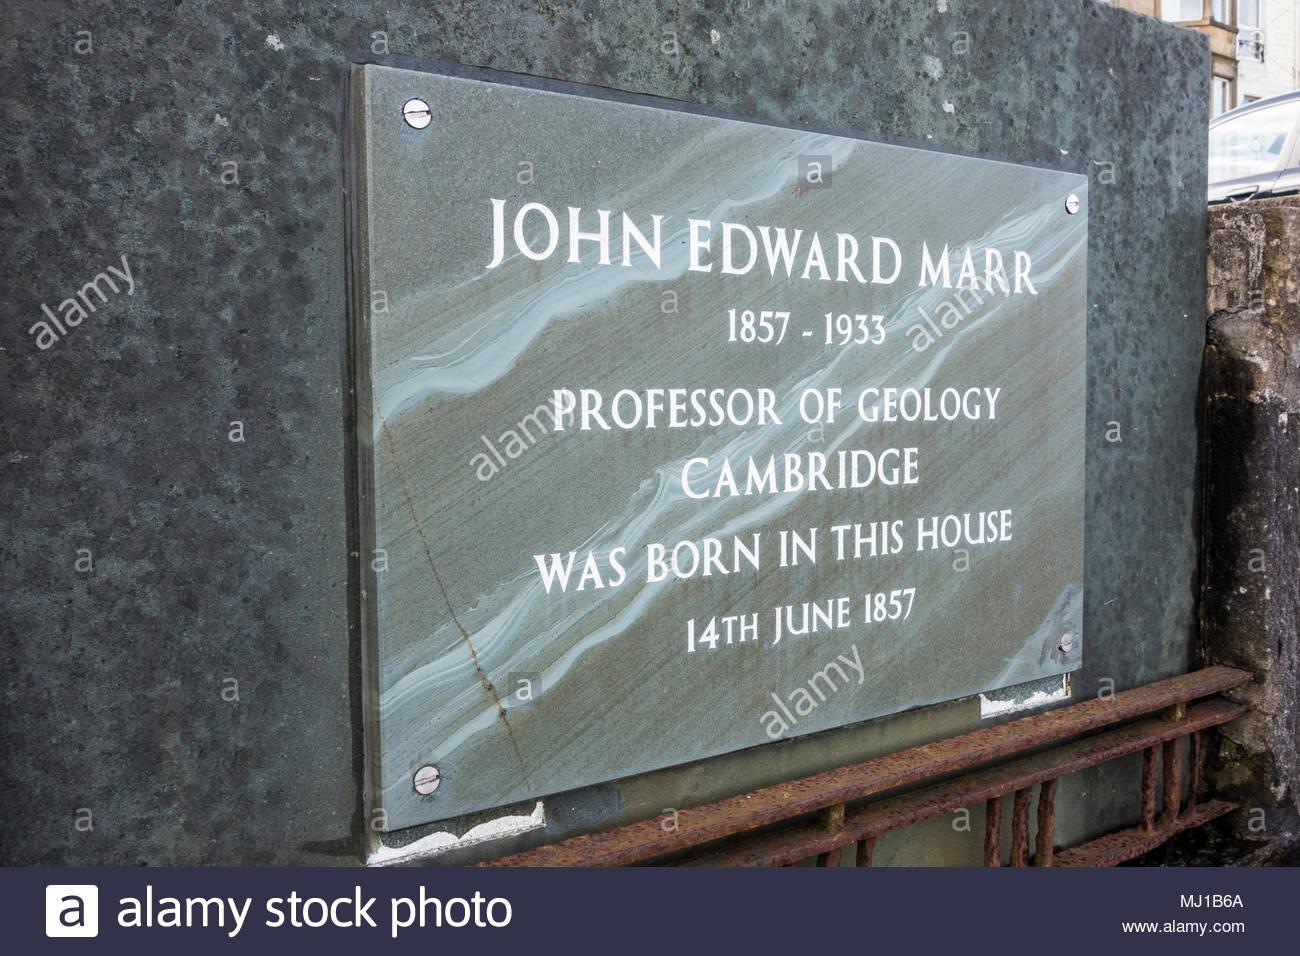 Plaque on Morecambe Promenade commemorating John Edward Marr, Professor of Geology at Cambridge - Stock Image